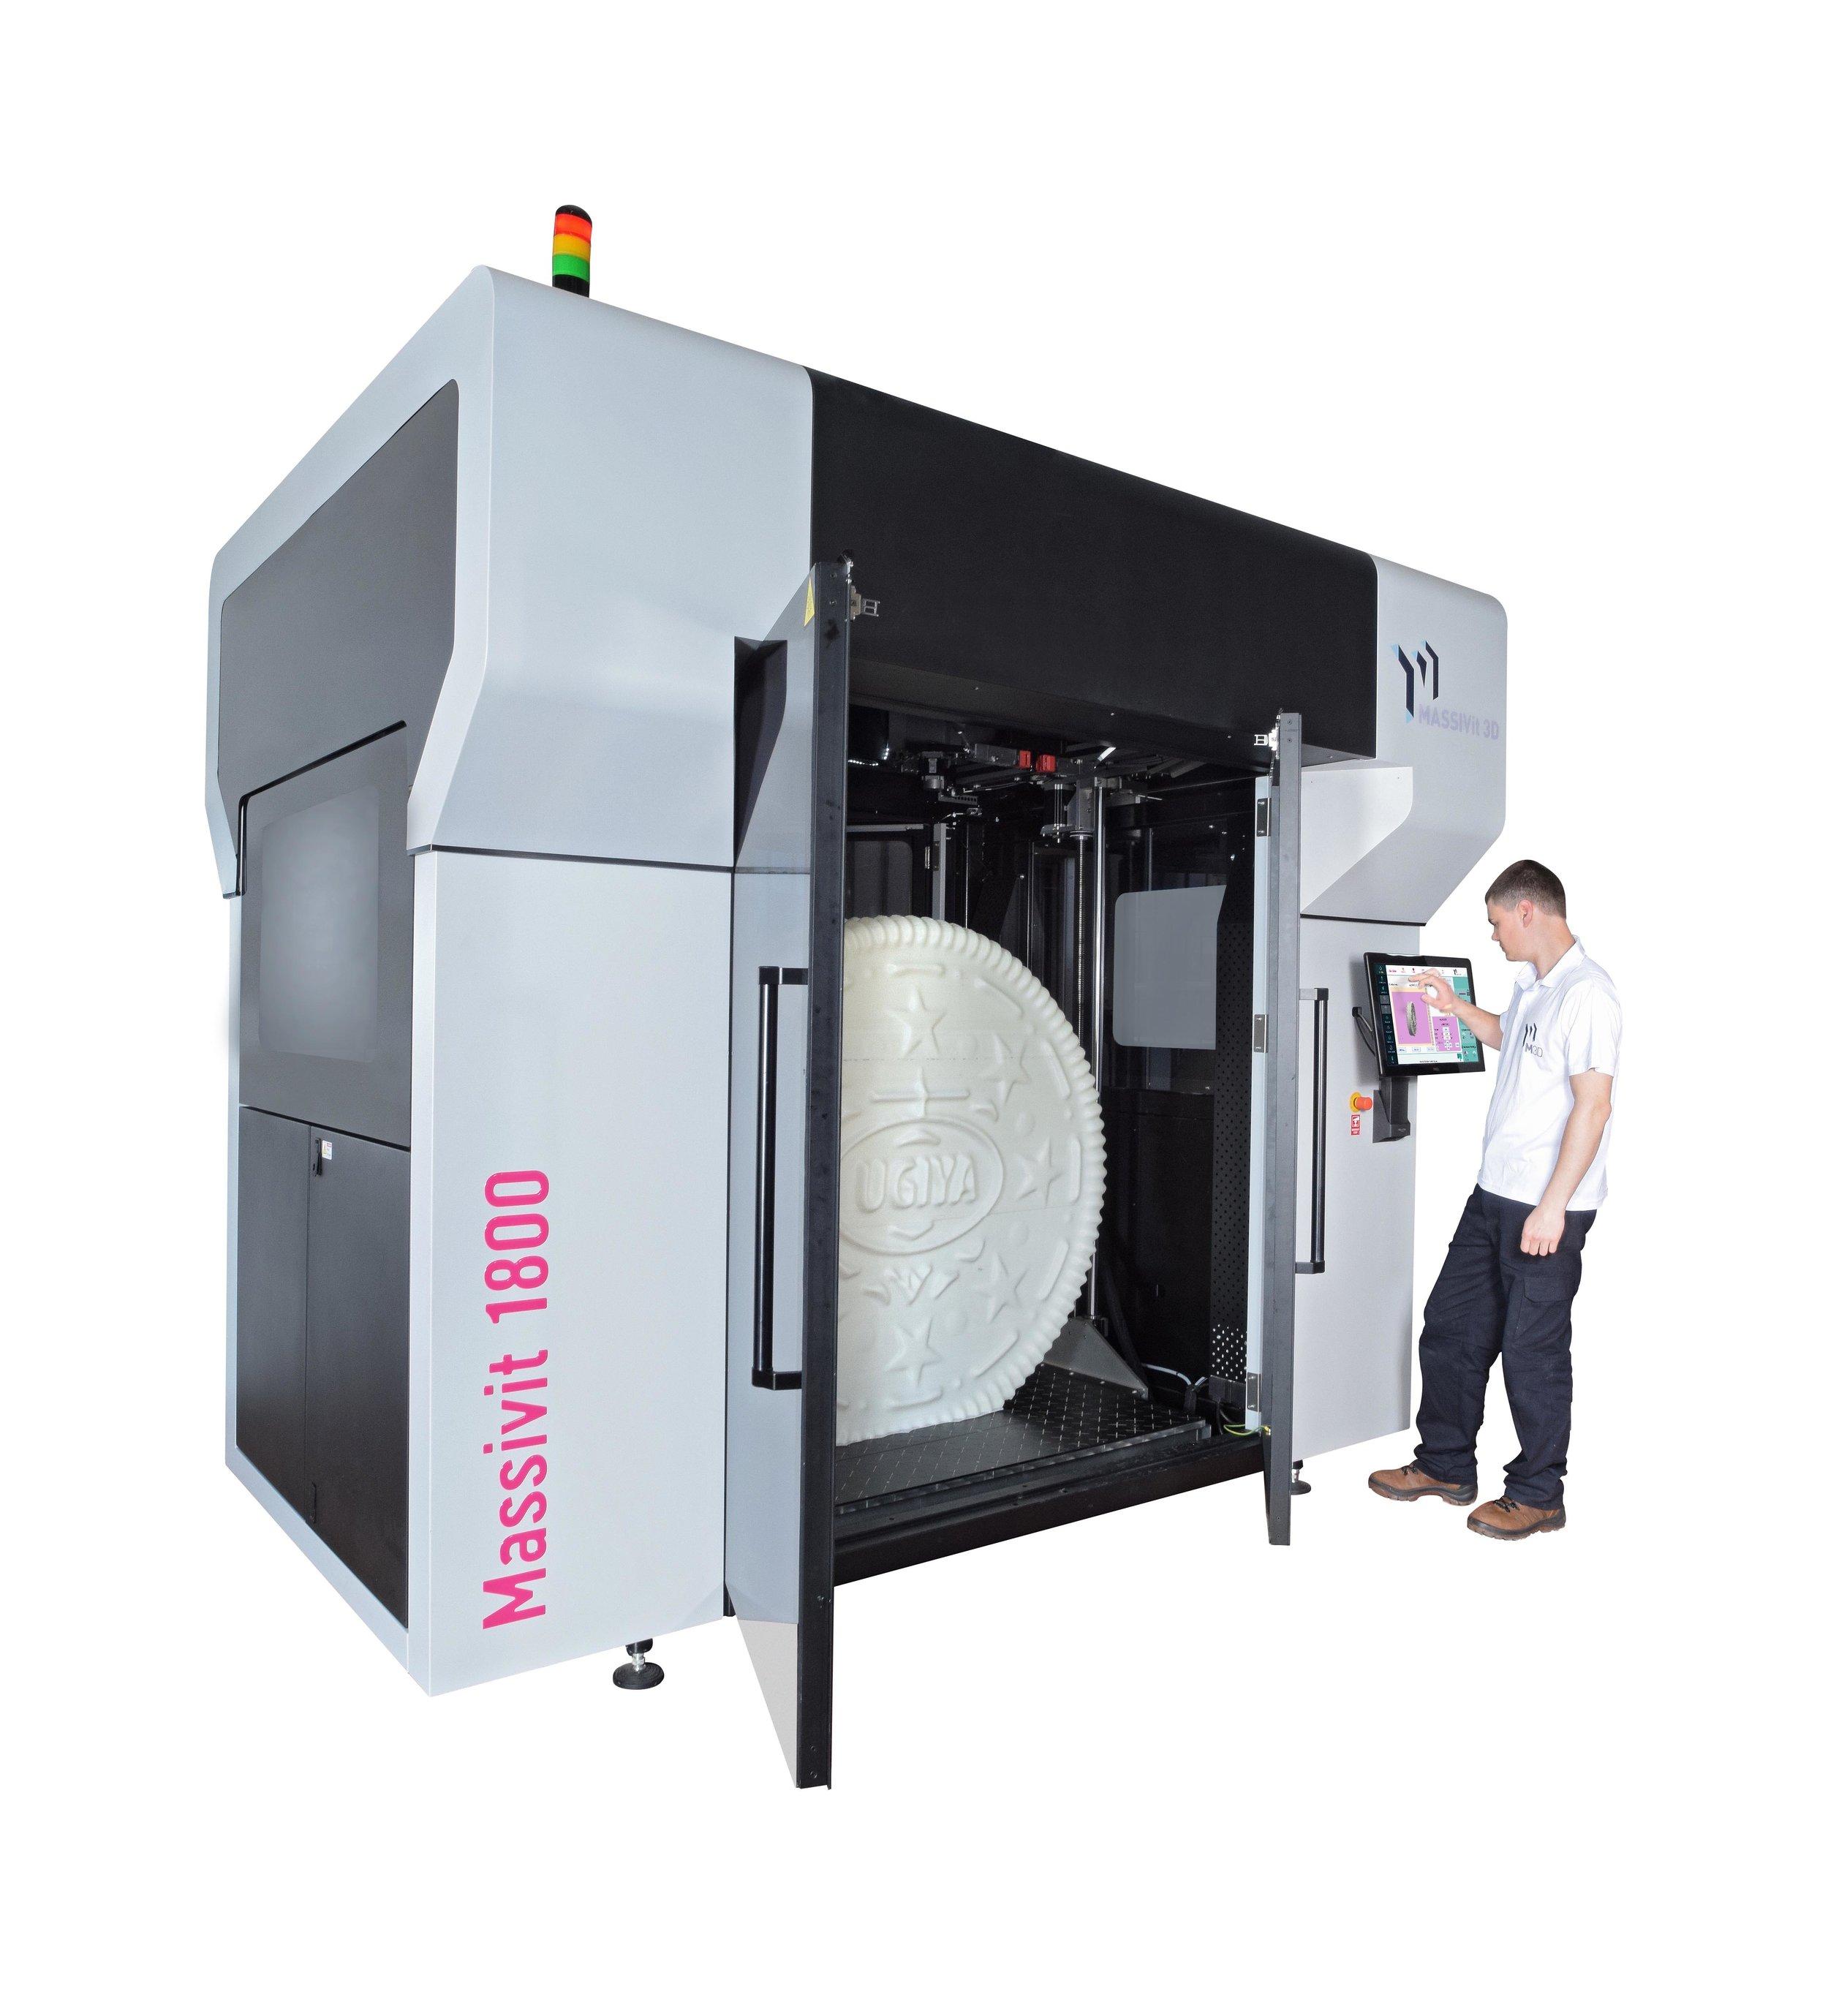 Massivit-1800-3D-printer.jpg